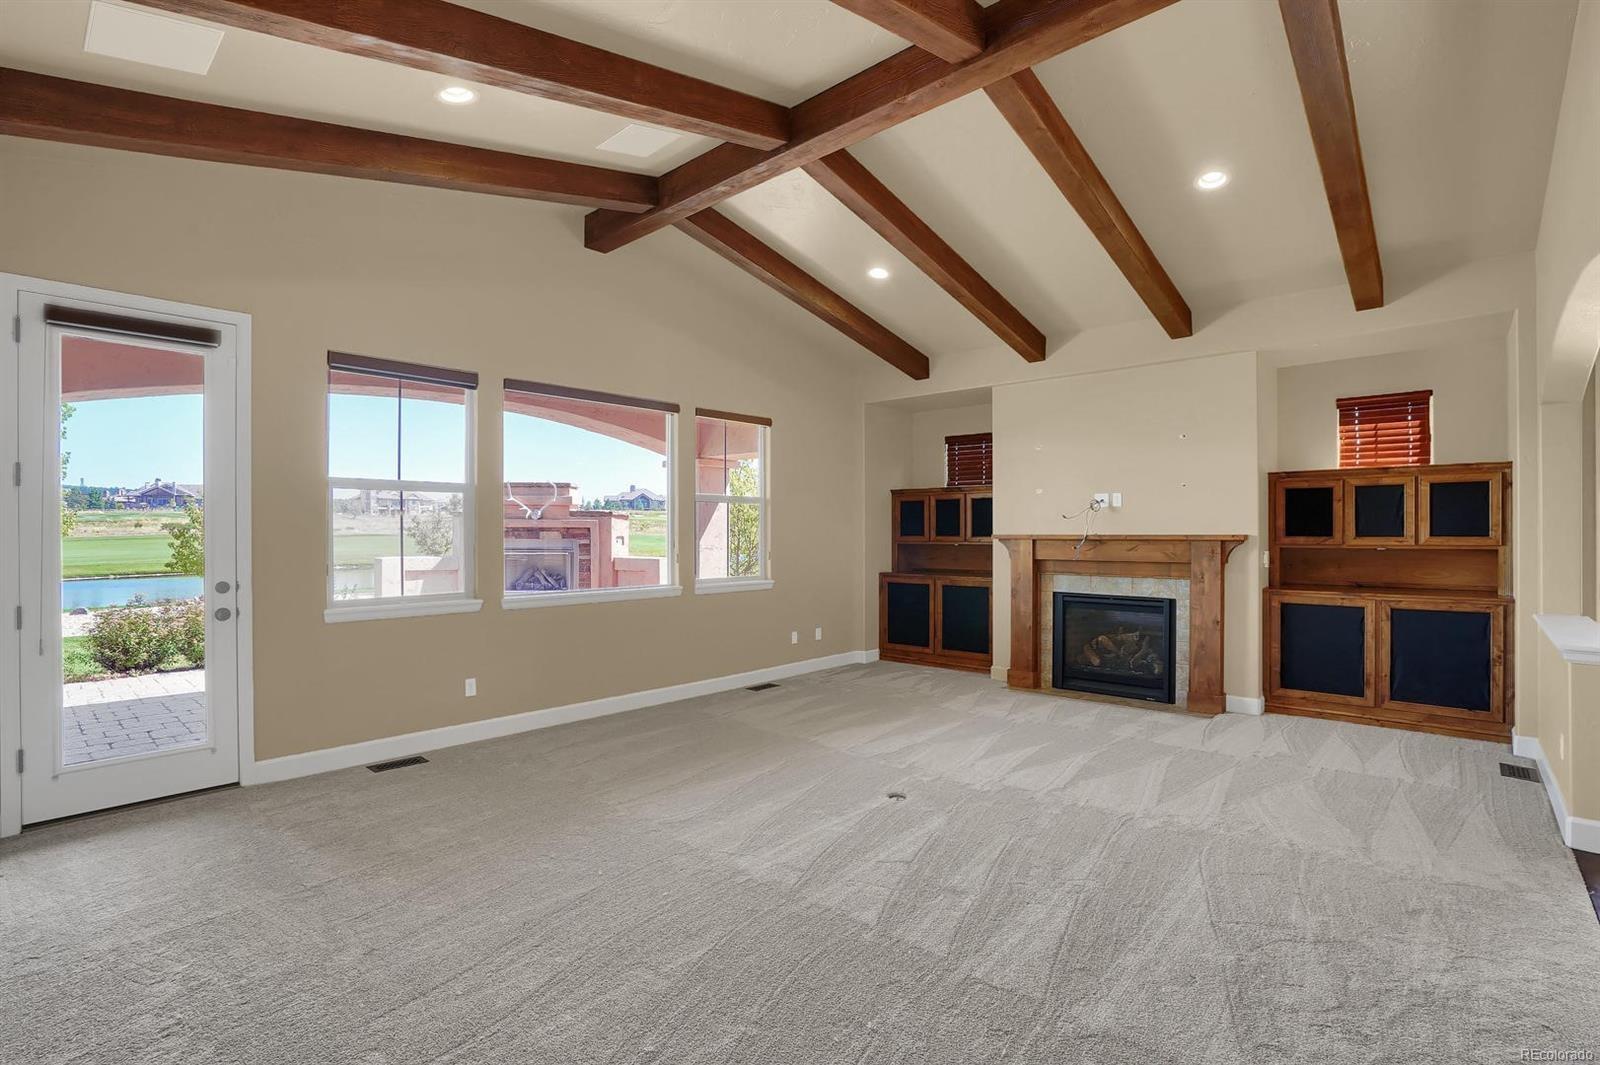 MLS# 7383029 - 18 - 2276 Rocking Horse Court, Colorado Springs, CO 80921